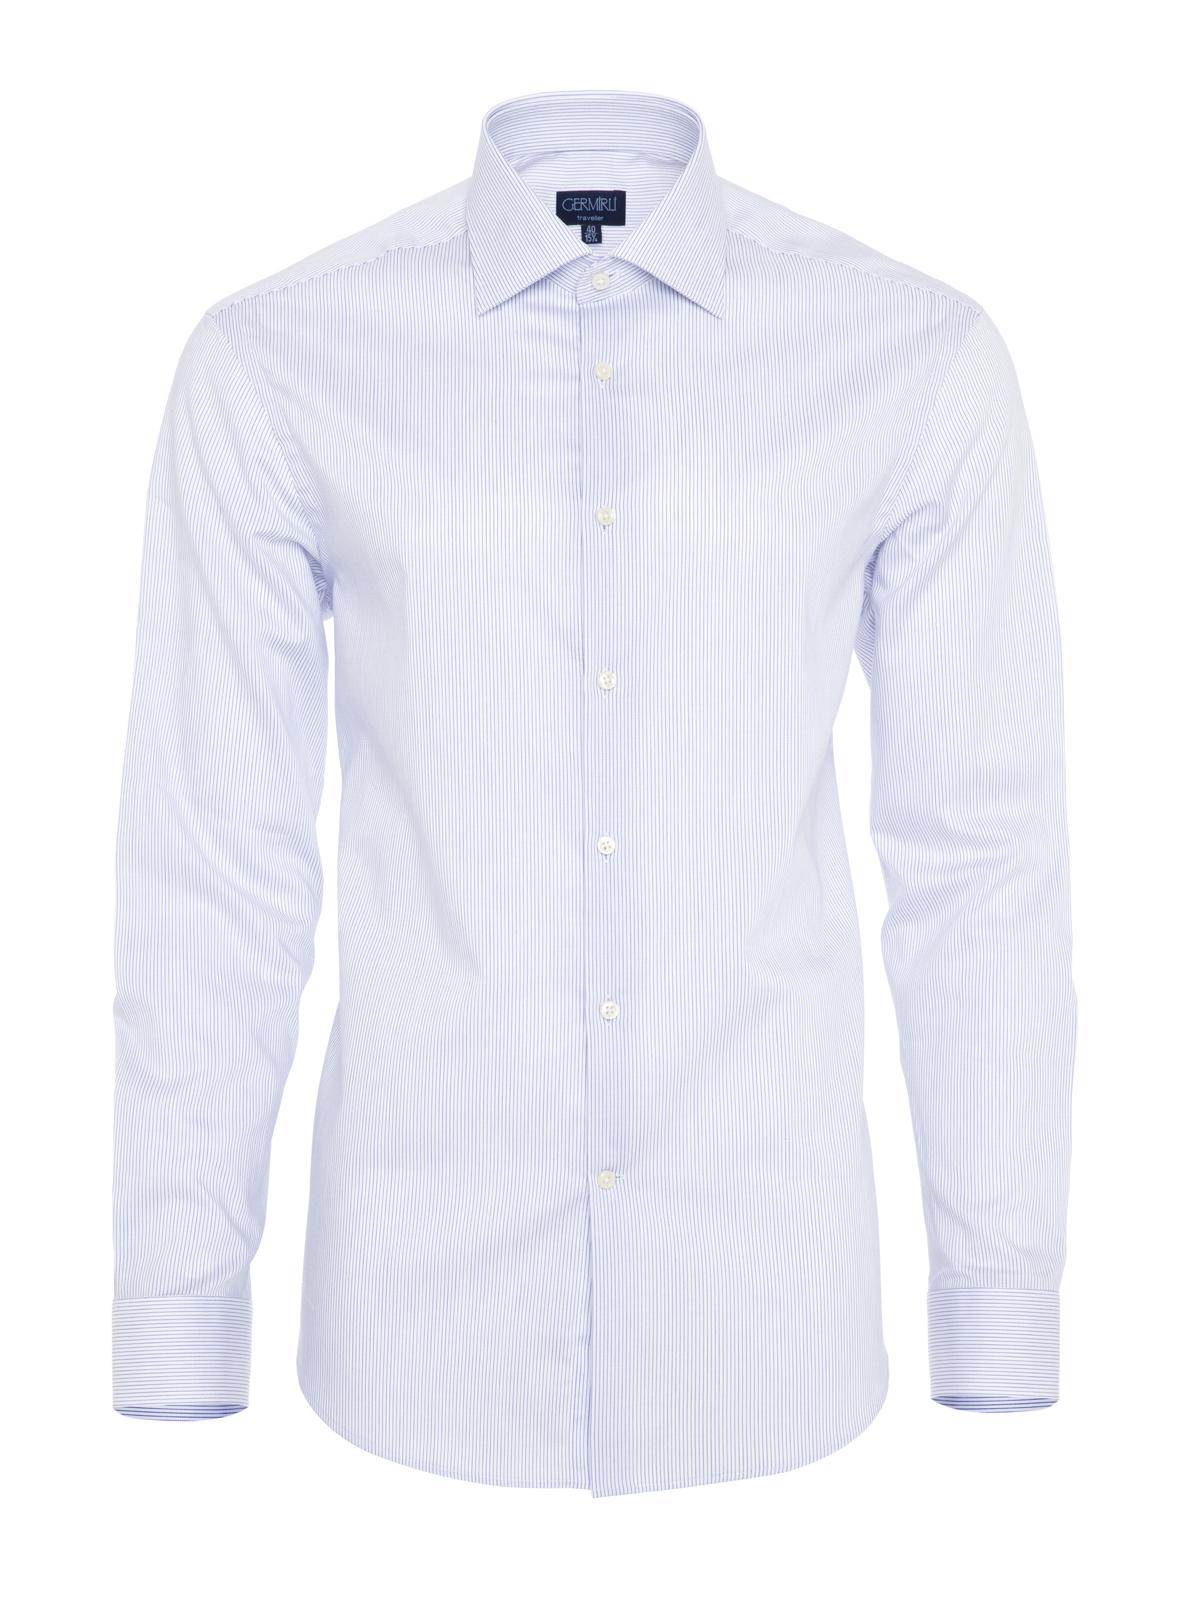 Germirli Non Iron Laci Çizgili Klasik Yaka Tailor Fit Gömlek